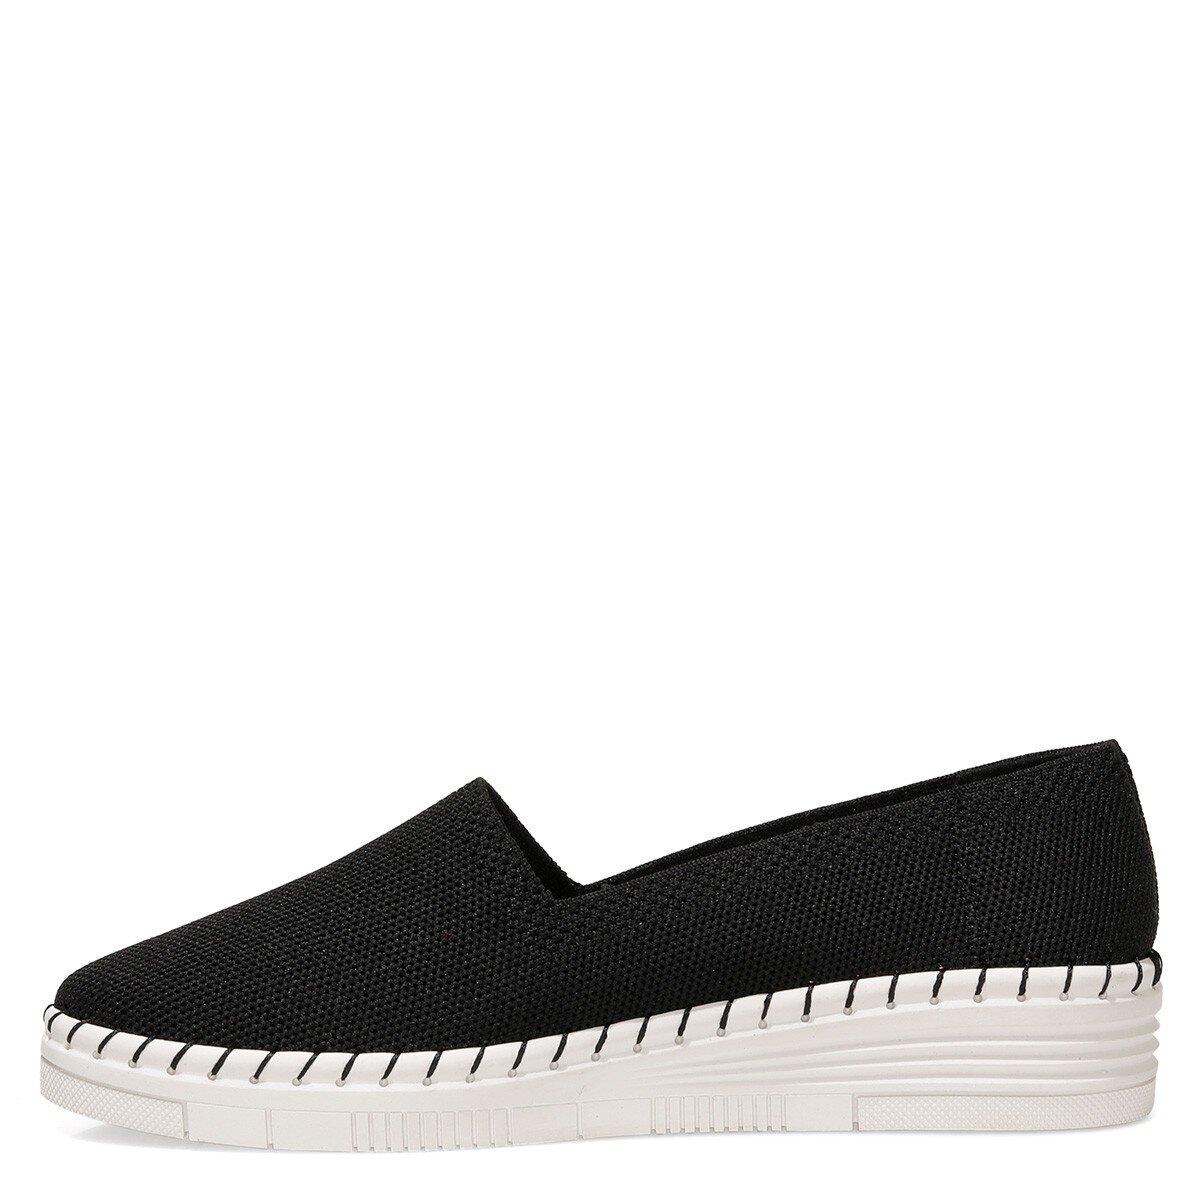 GRETCHEN2 1FX Siyah Kadın Loafer